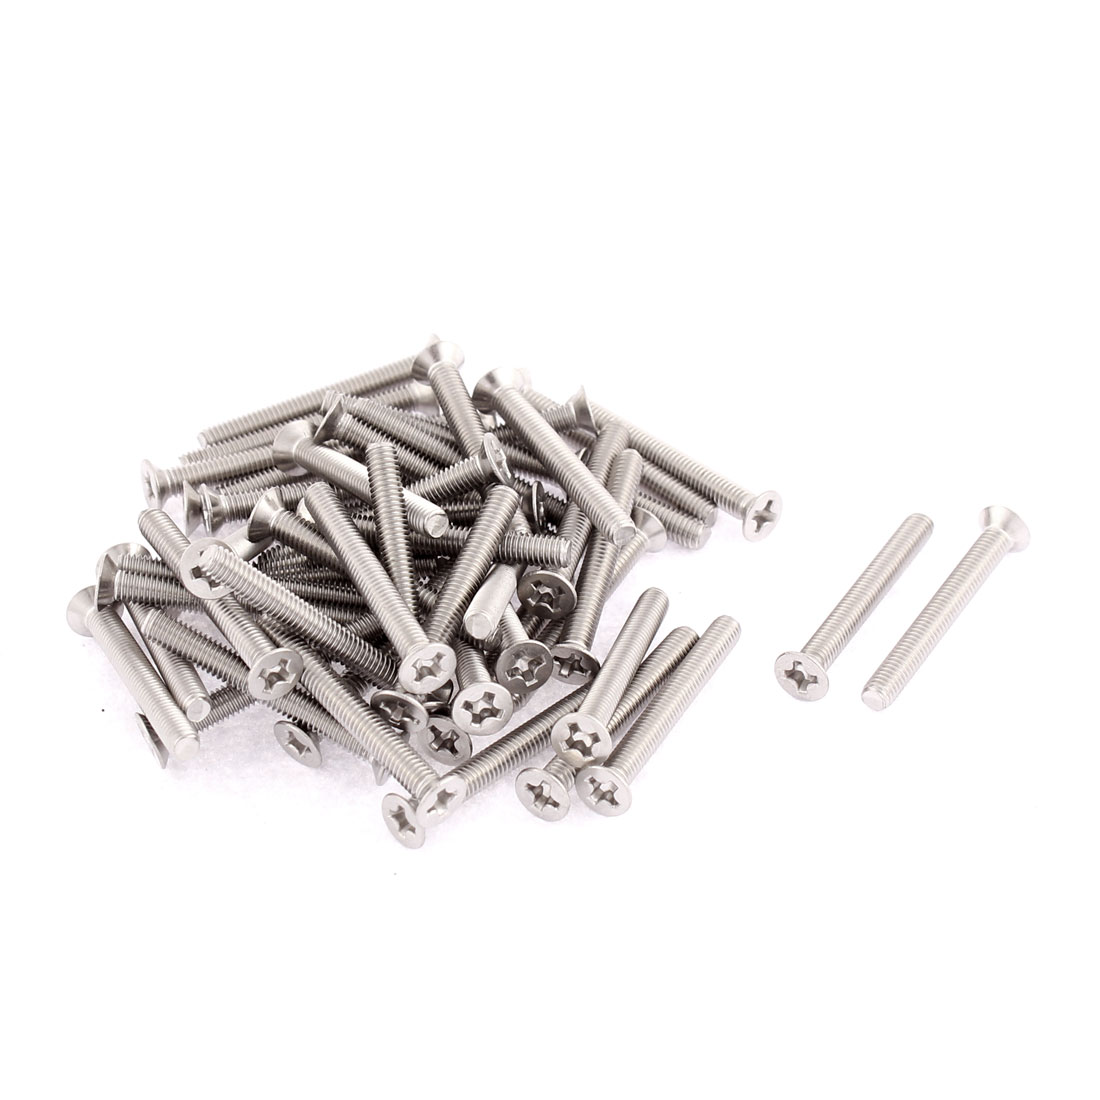 M3 x 25mm Phillips Flat Head Stainless Steel Countersunk Bolts Screws 50pcs